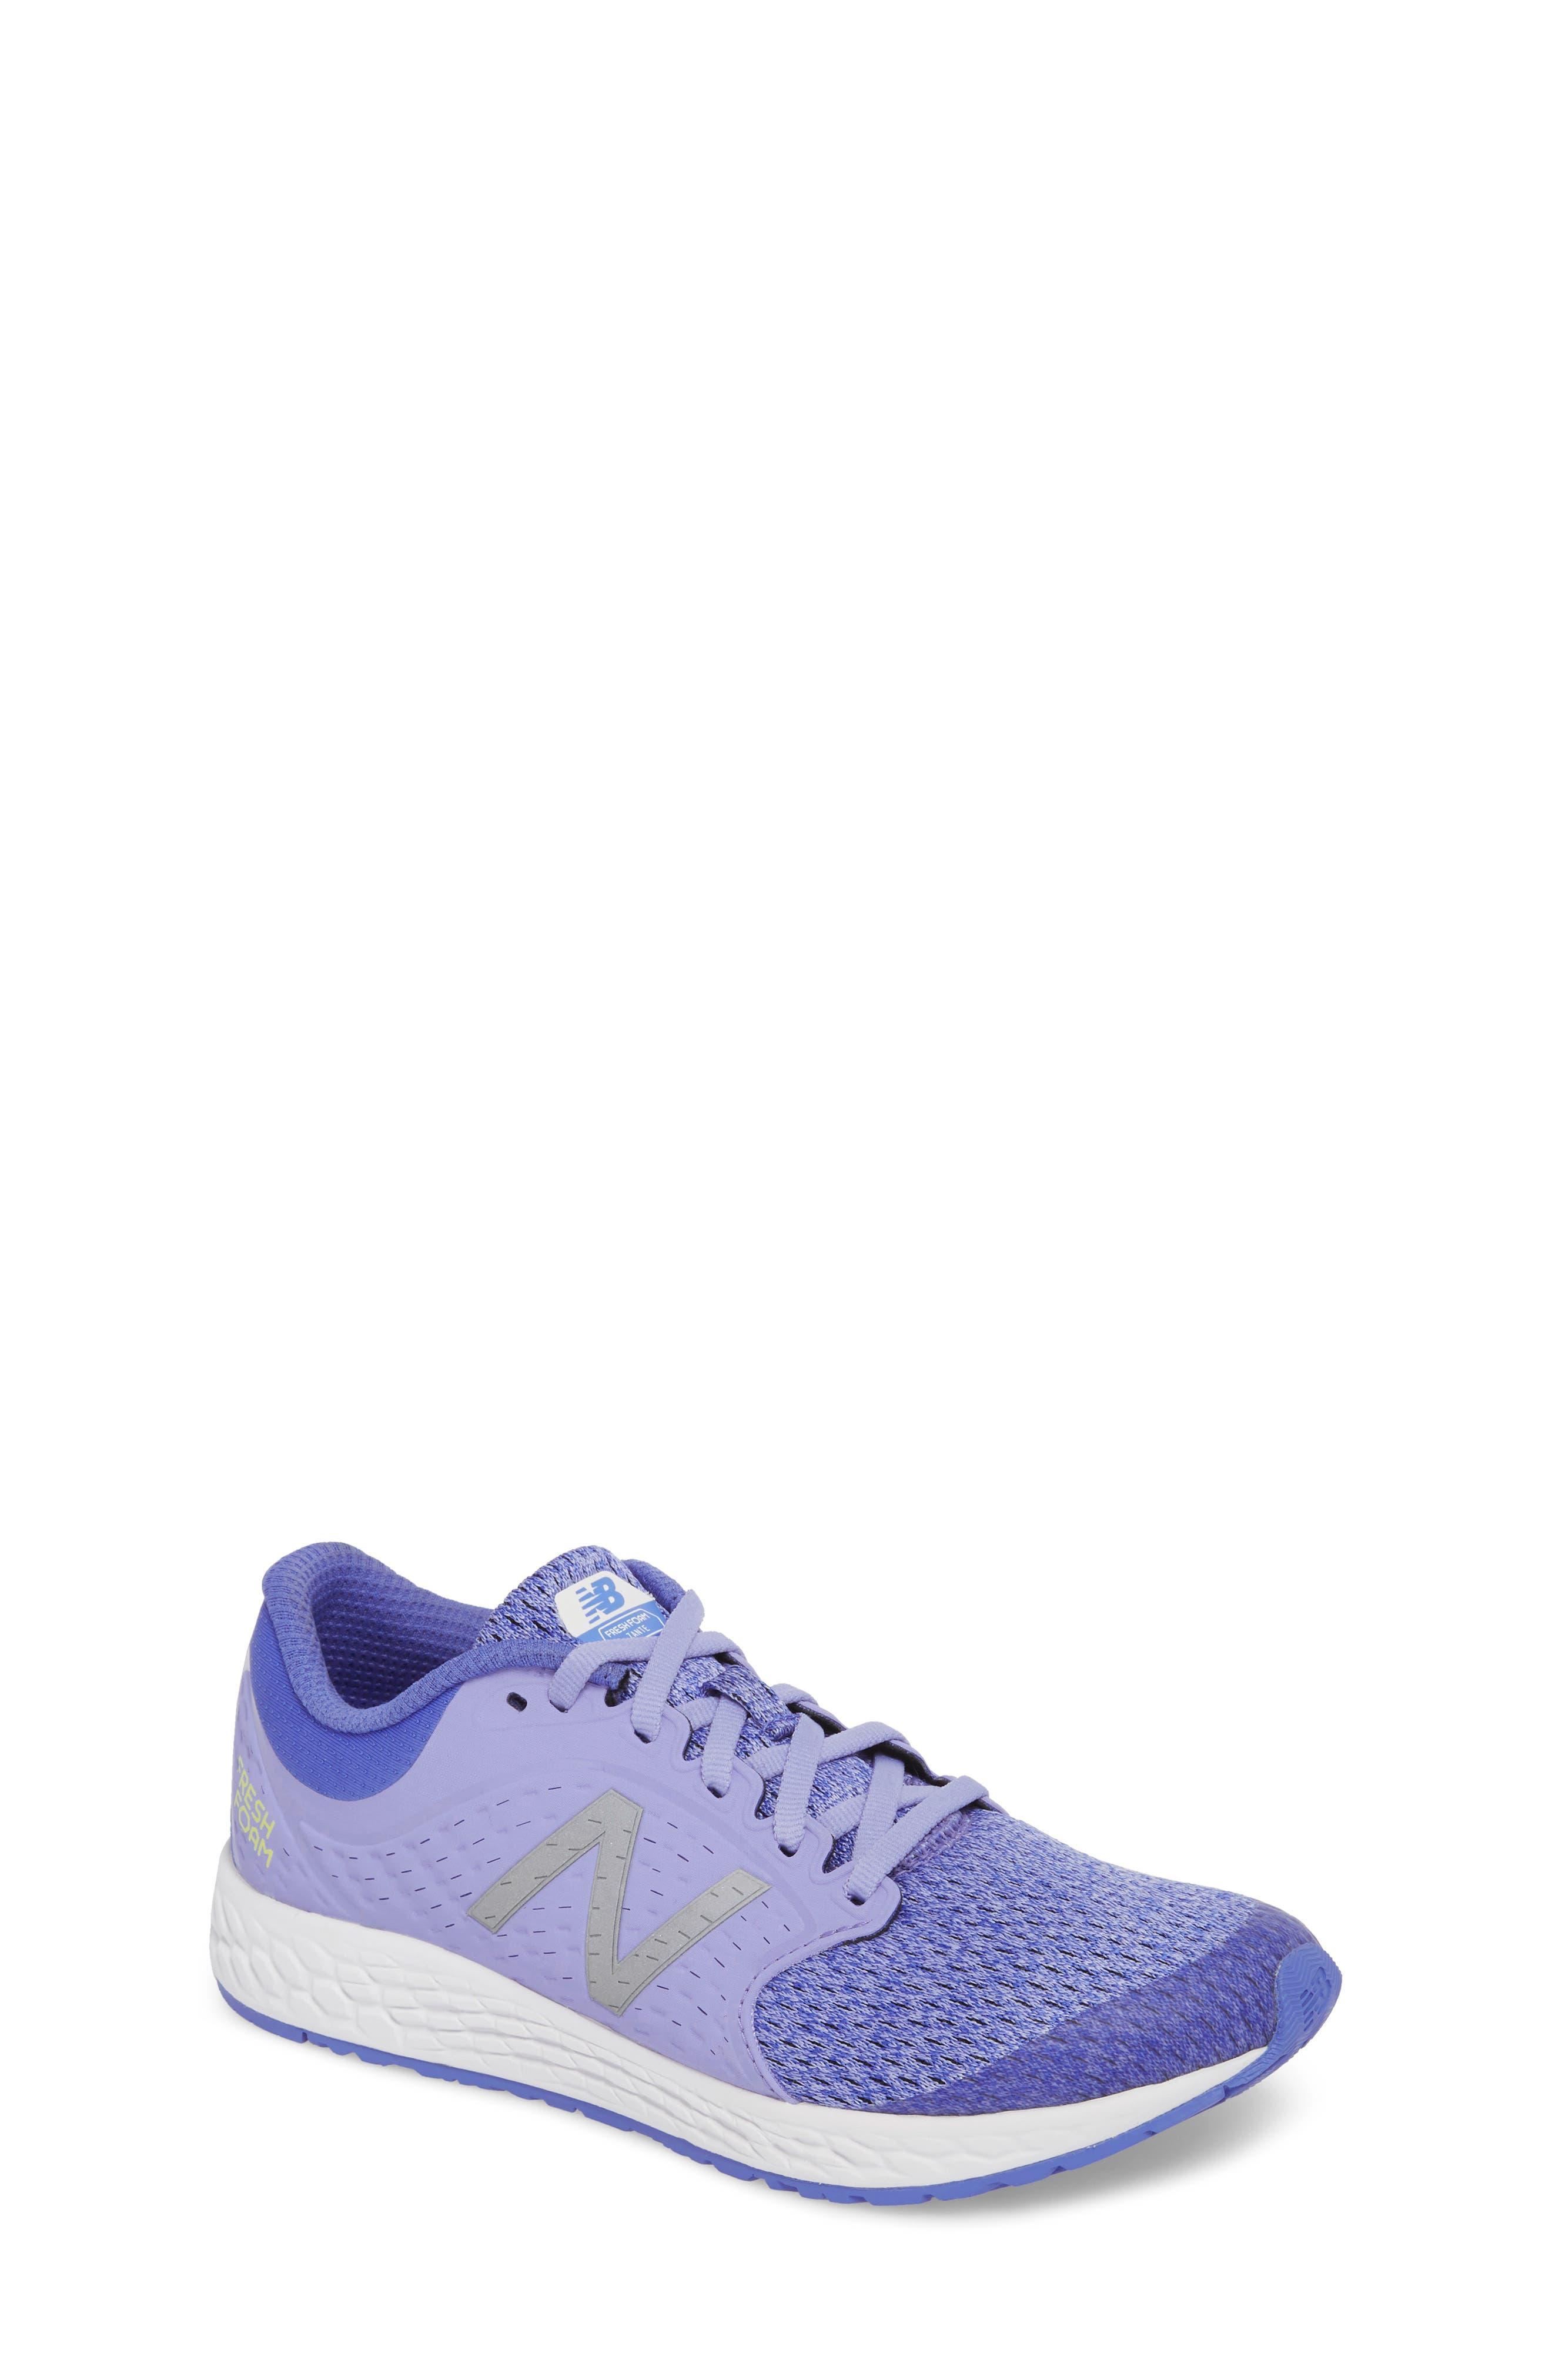 Fresh Foam Zante v4 Running Shoe,                         Main,                         color, Ice Violet